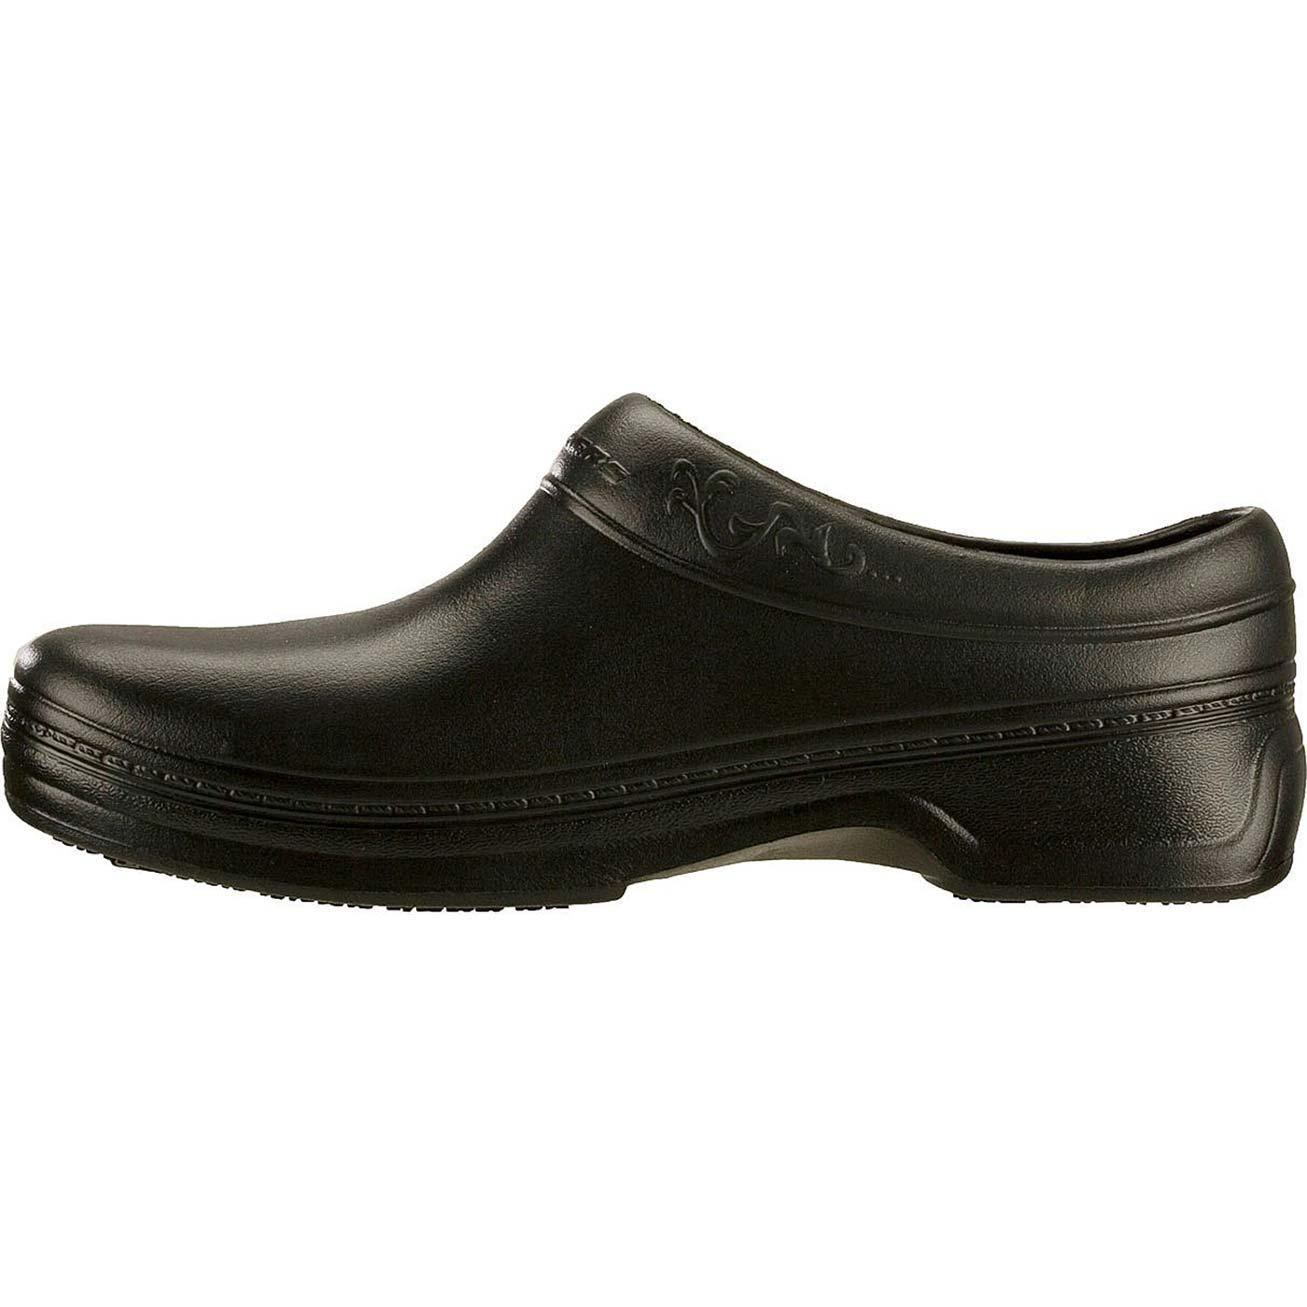 fc30a9c250d Images. SKECHERS Work Oswald Clara Women s Slip-Resistant ...